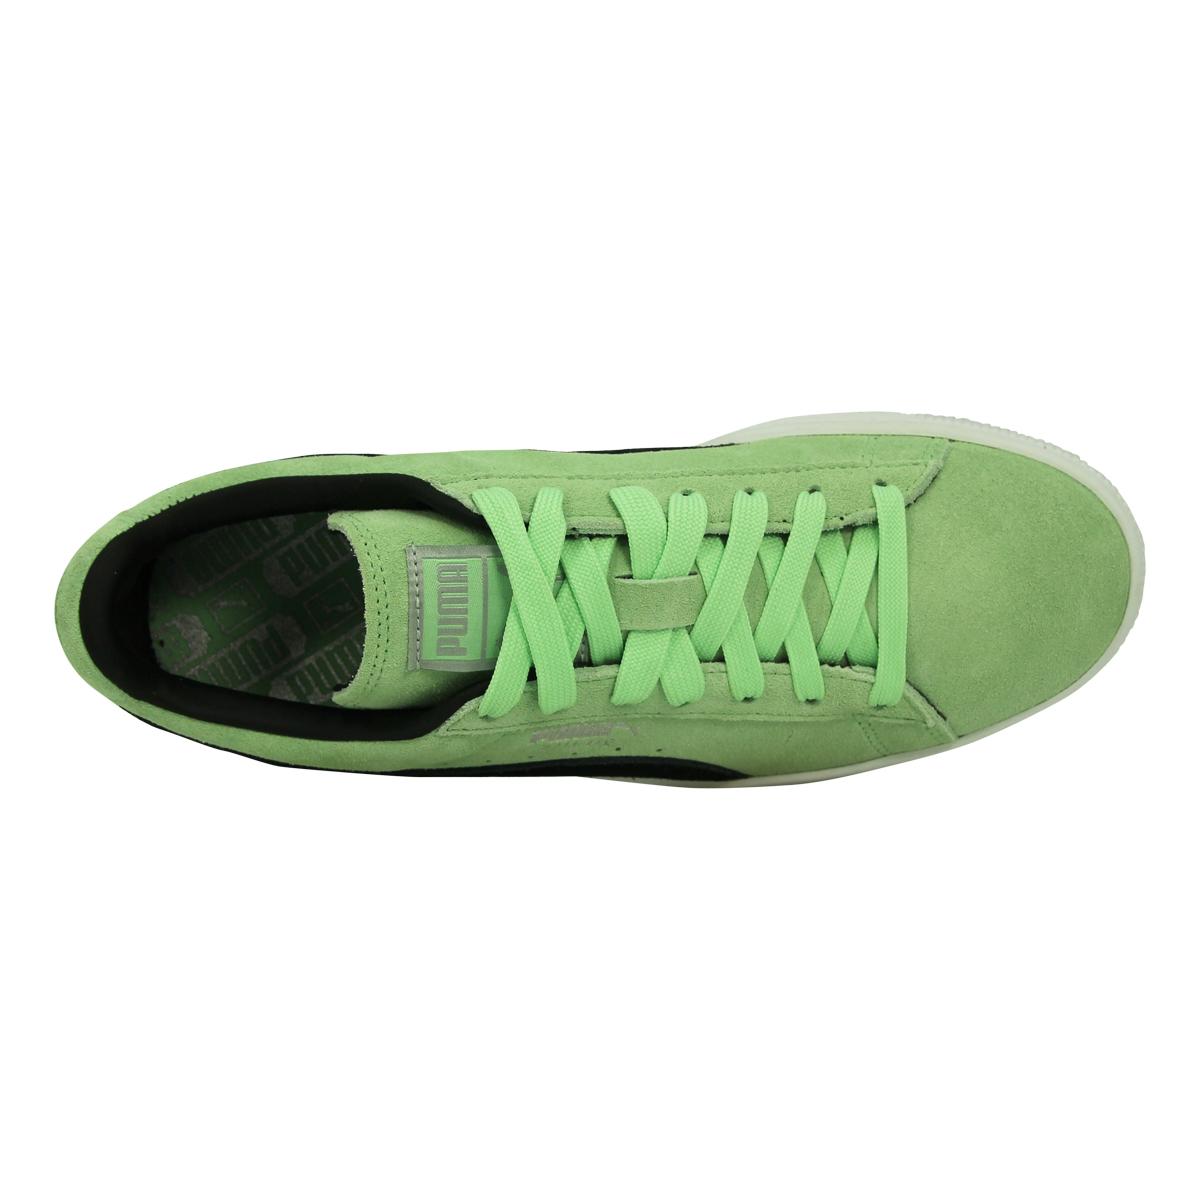 Puma Leder Neu Schuhe Suede Sneakers Herren Classic vqxavw4rZ 6652b2b207f